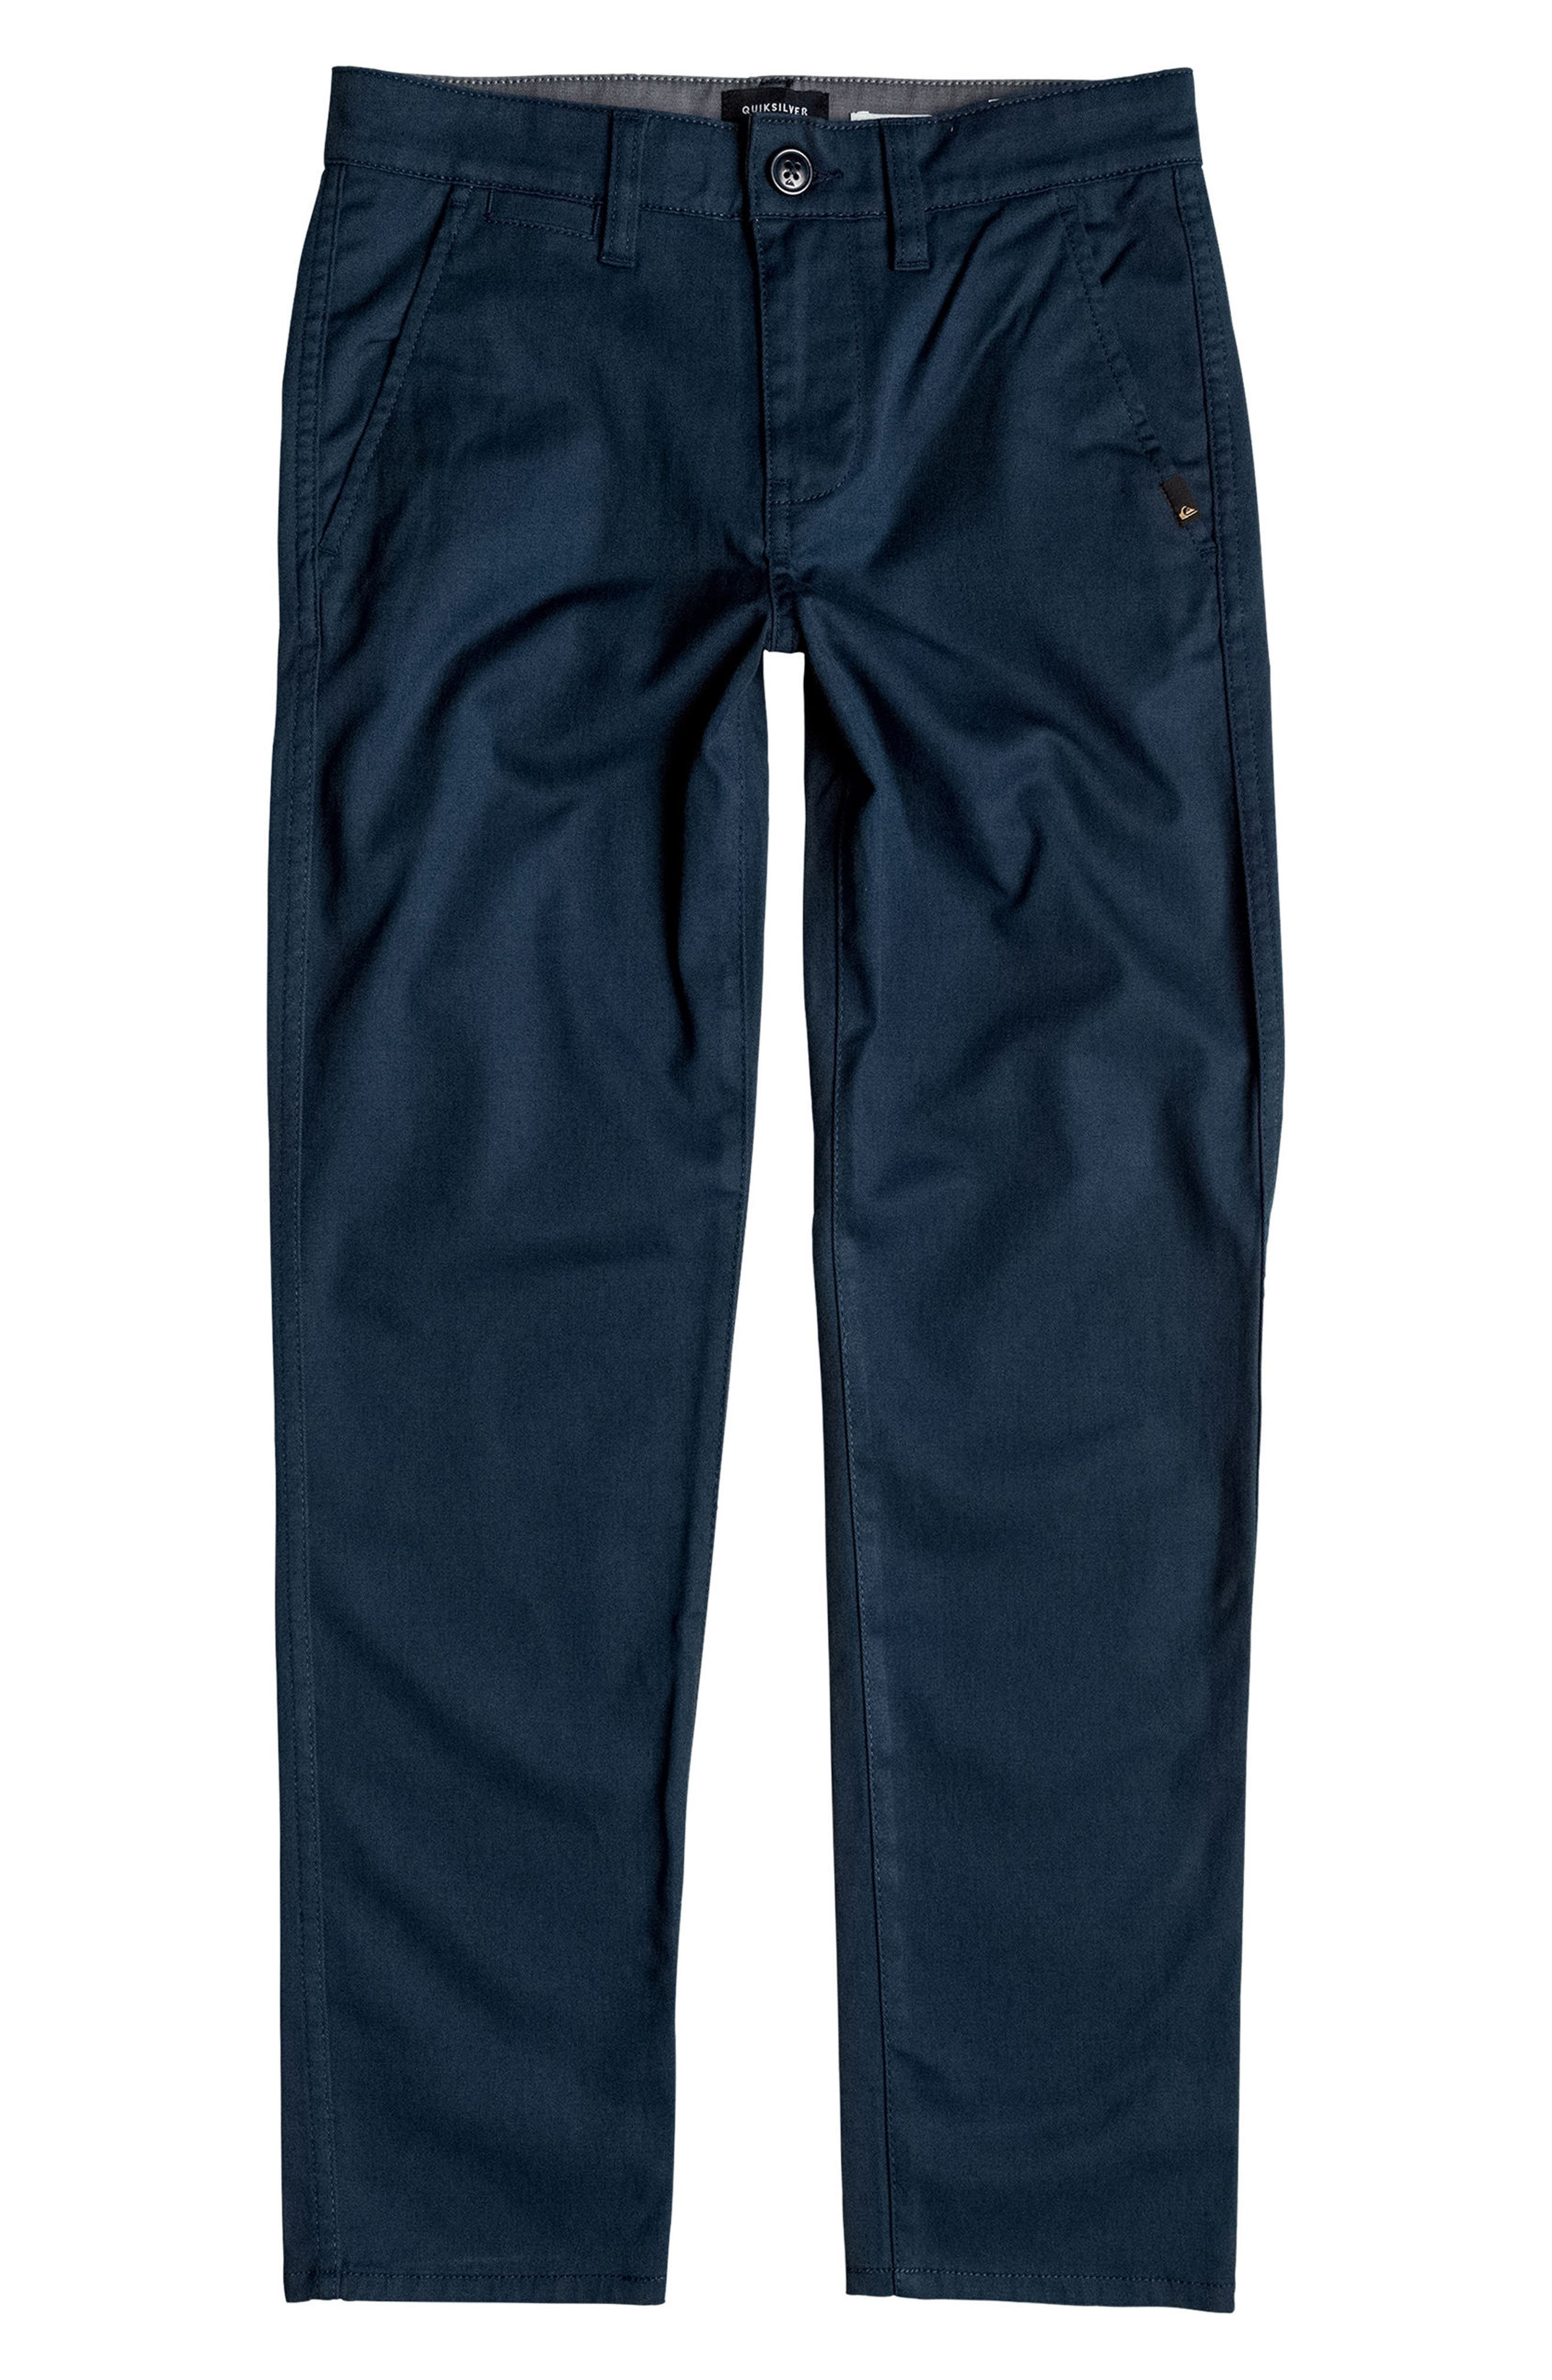 Regular Fit Everyday Union Pants,                             Main thumbnail 1, color,                             Navy Blazer